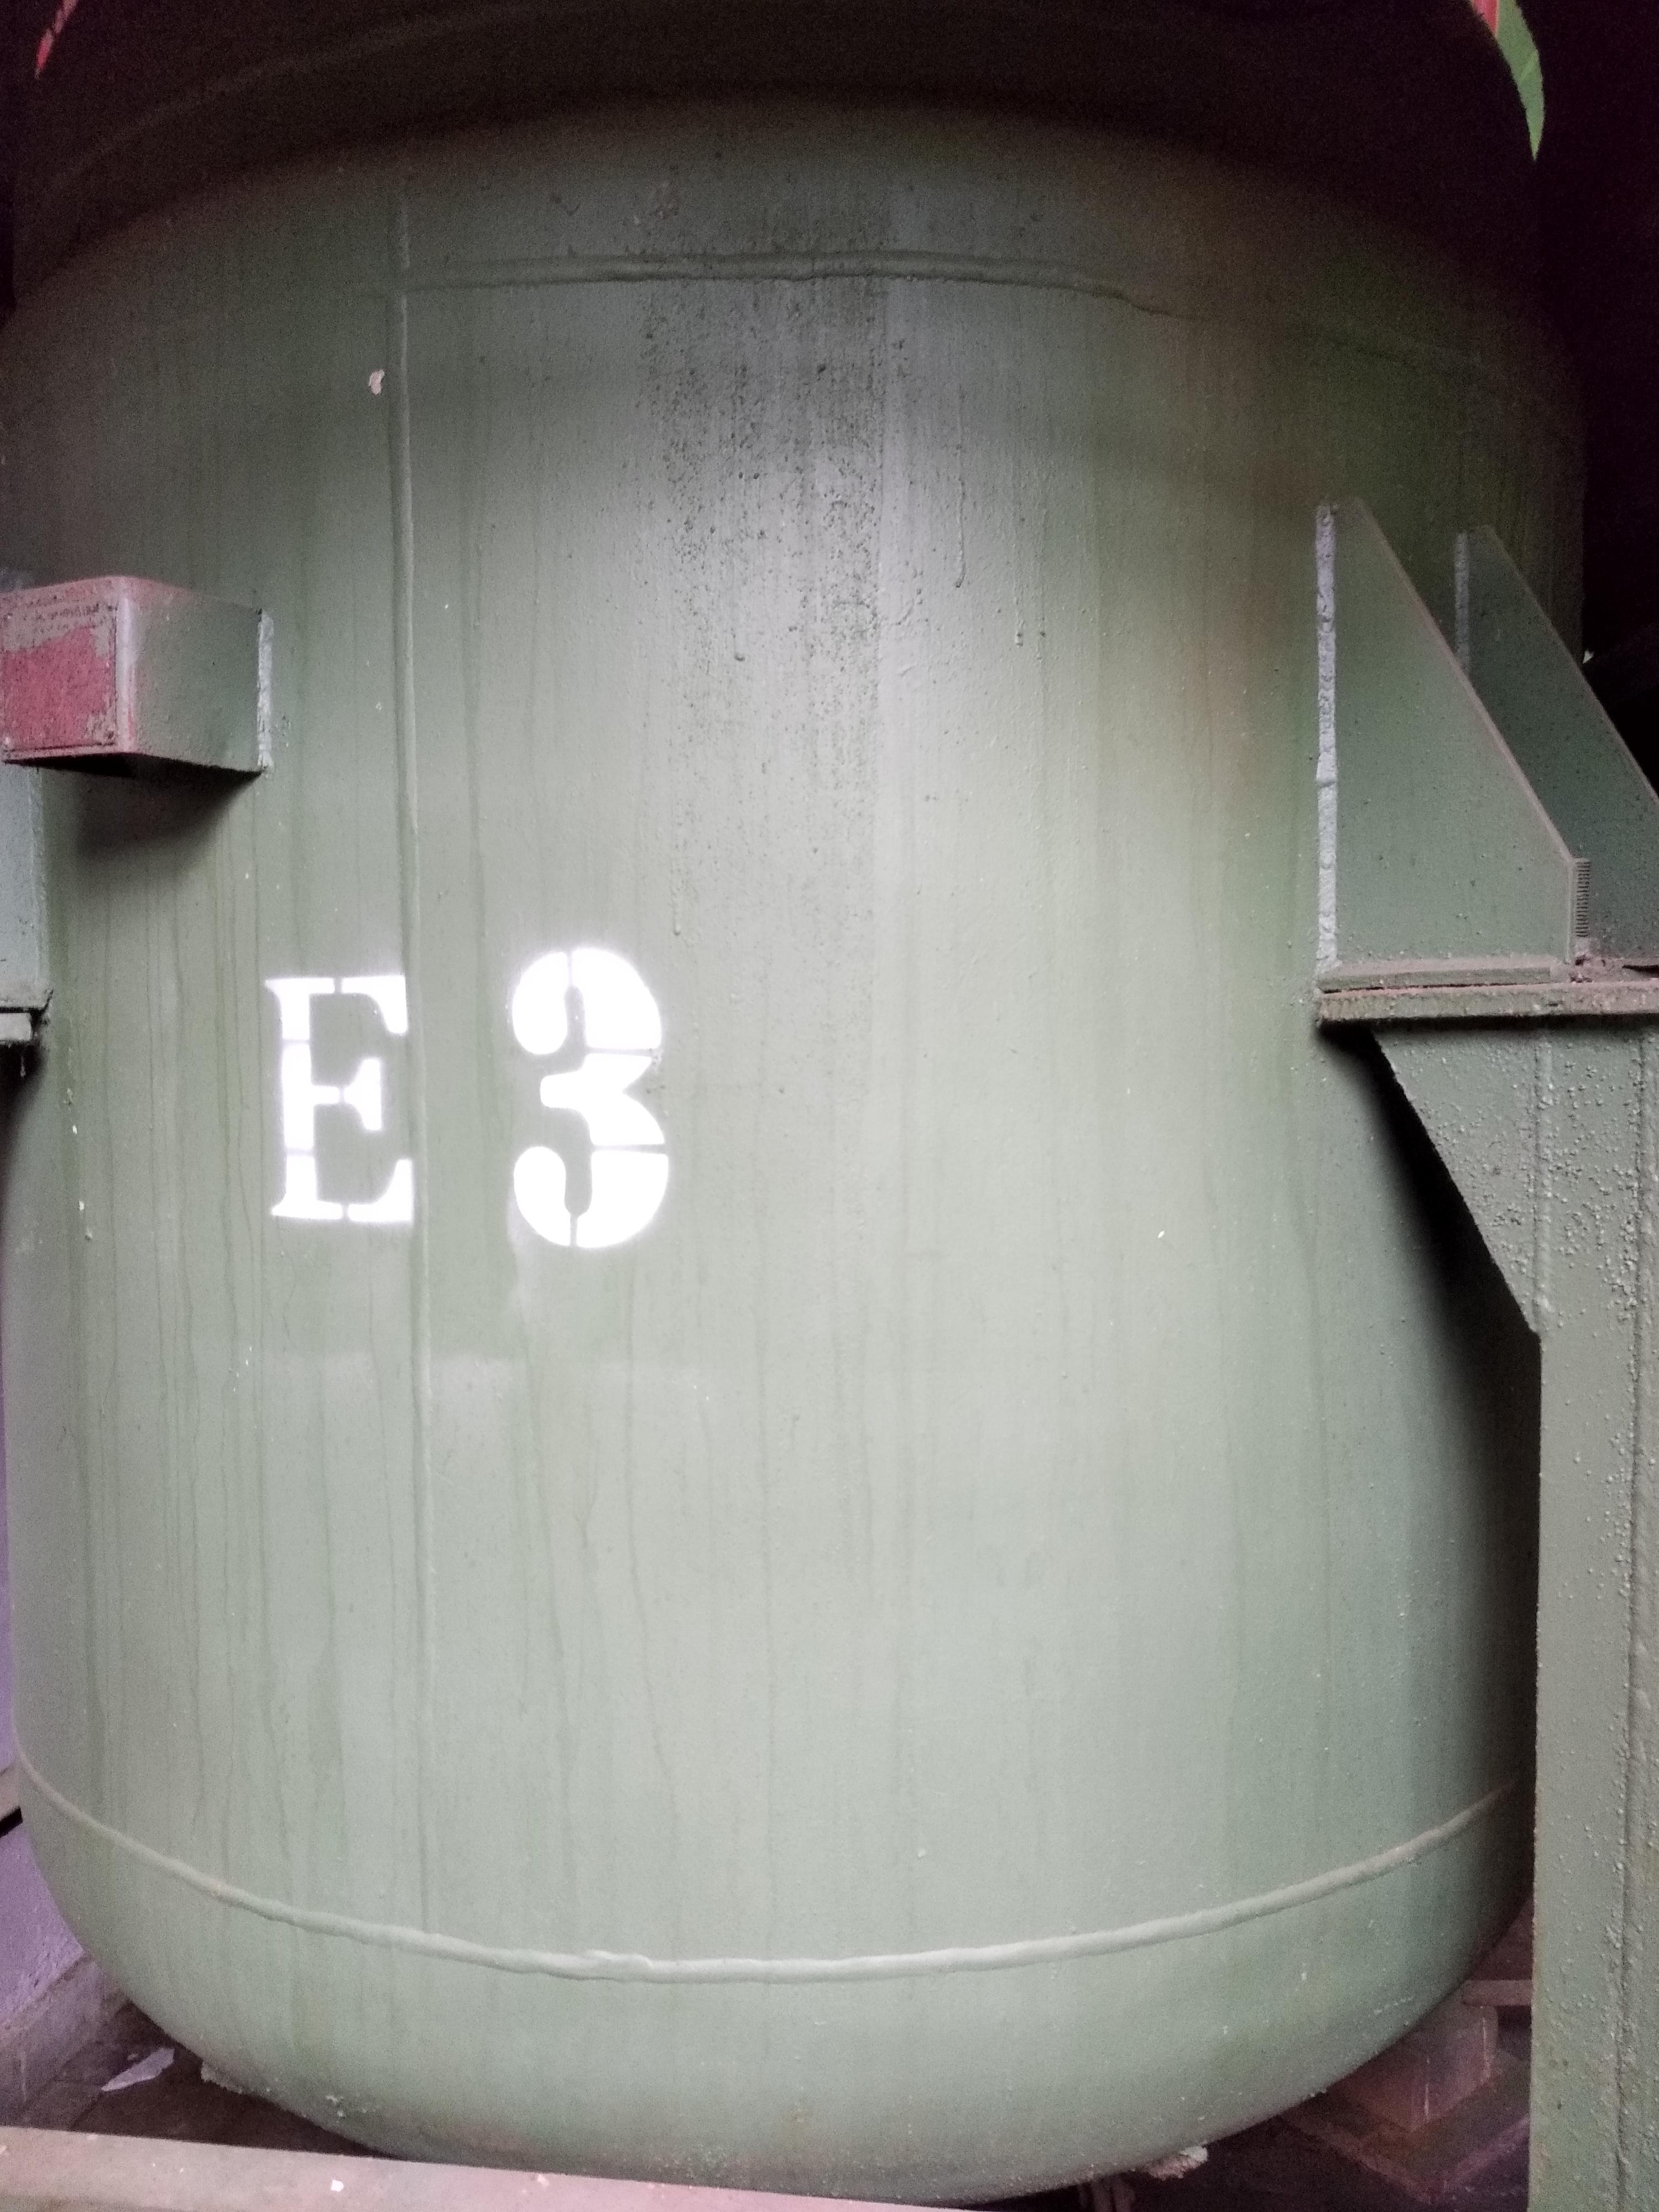 reaktor-vneshni-vid